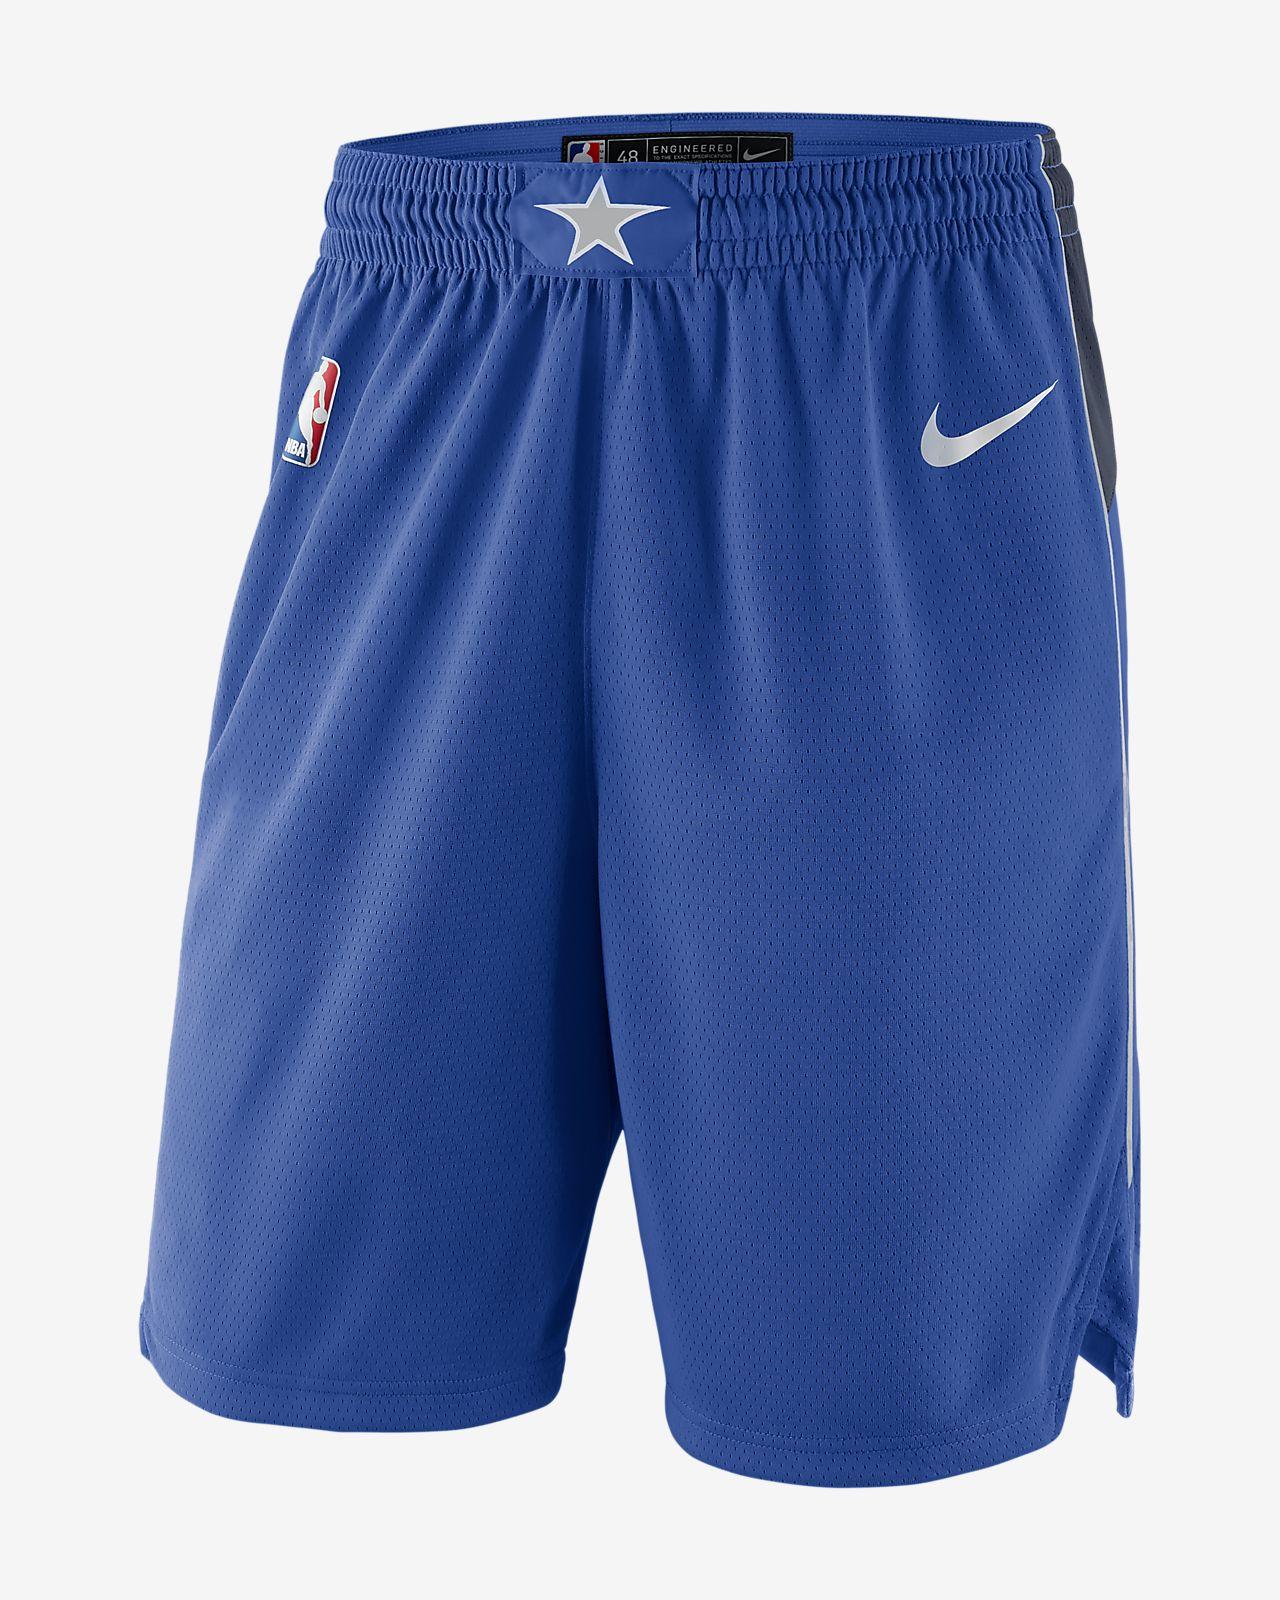 936a39a4199 Dallas Mavericks Icon Edition Swingman Men s Nike NBA Shorts. Nike.com